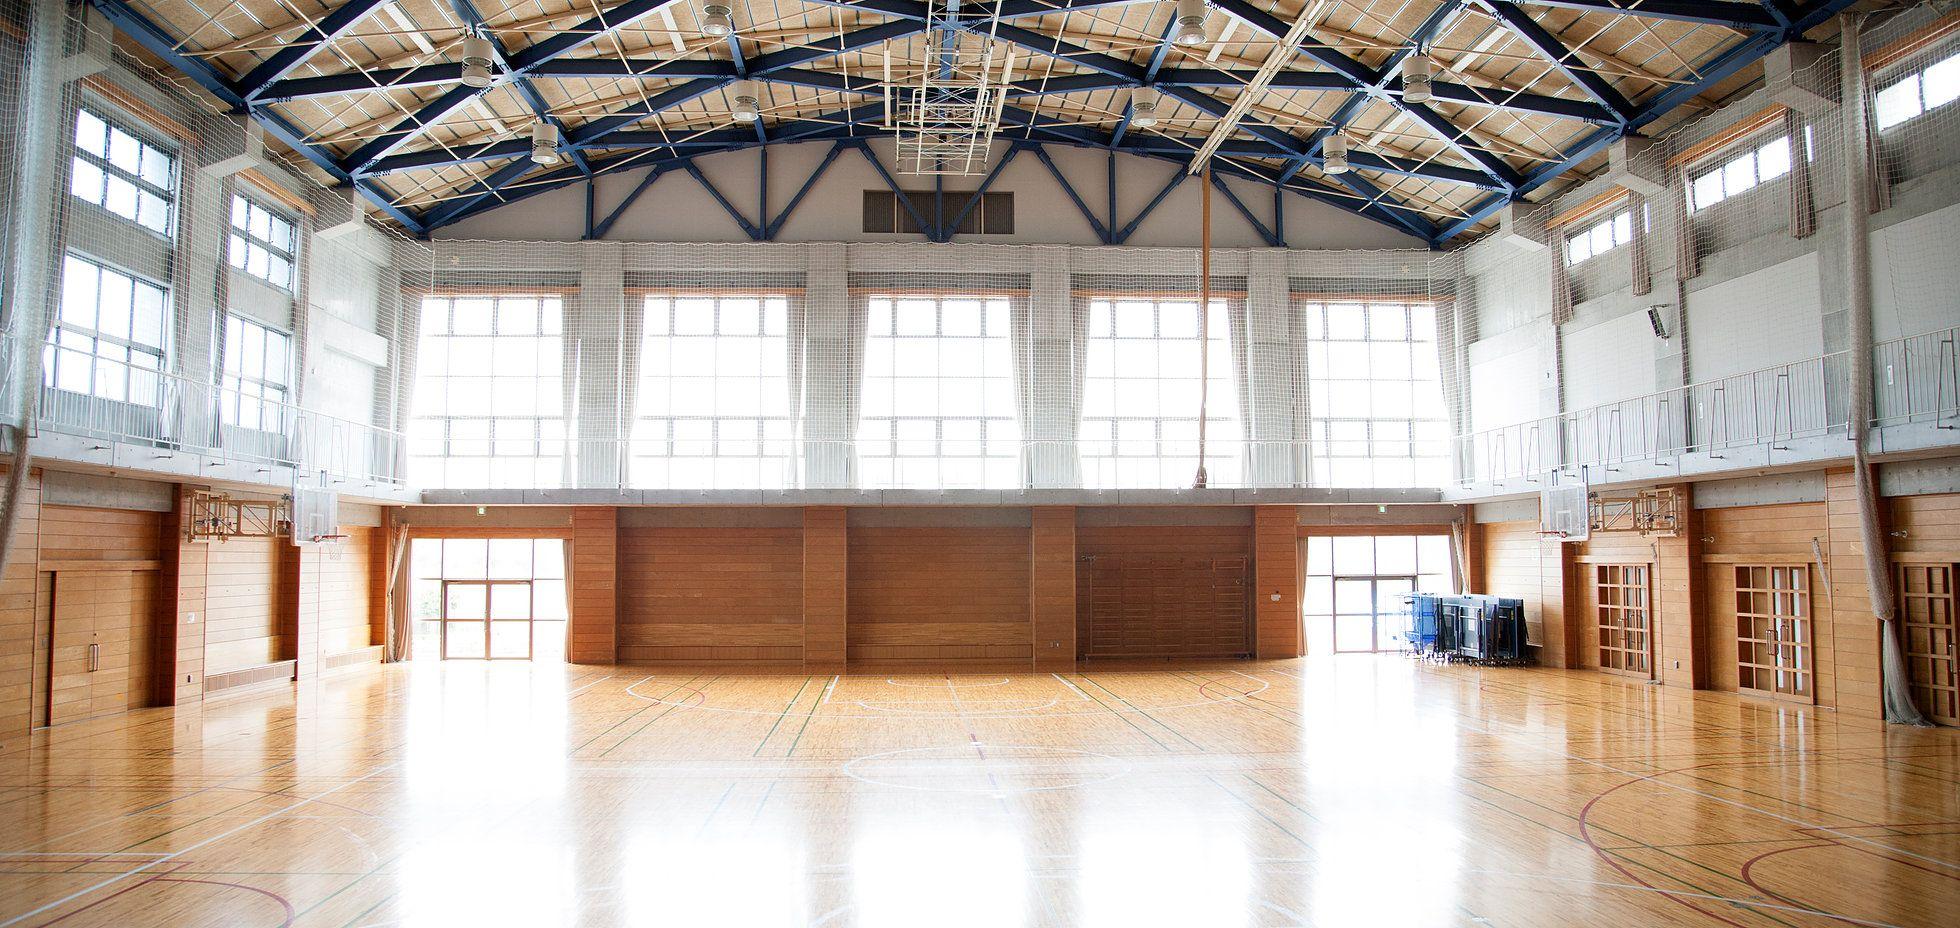 How To Teach Pe Videos Prime Coaching Sport Japanese High School High School Sport Hall